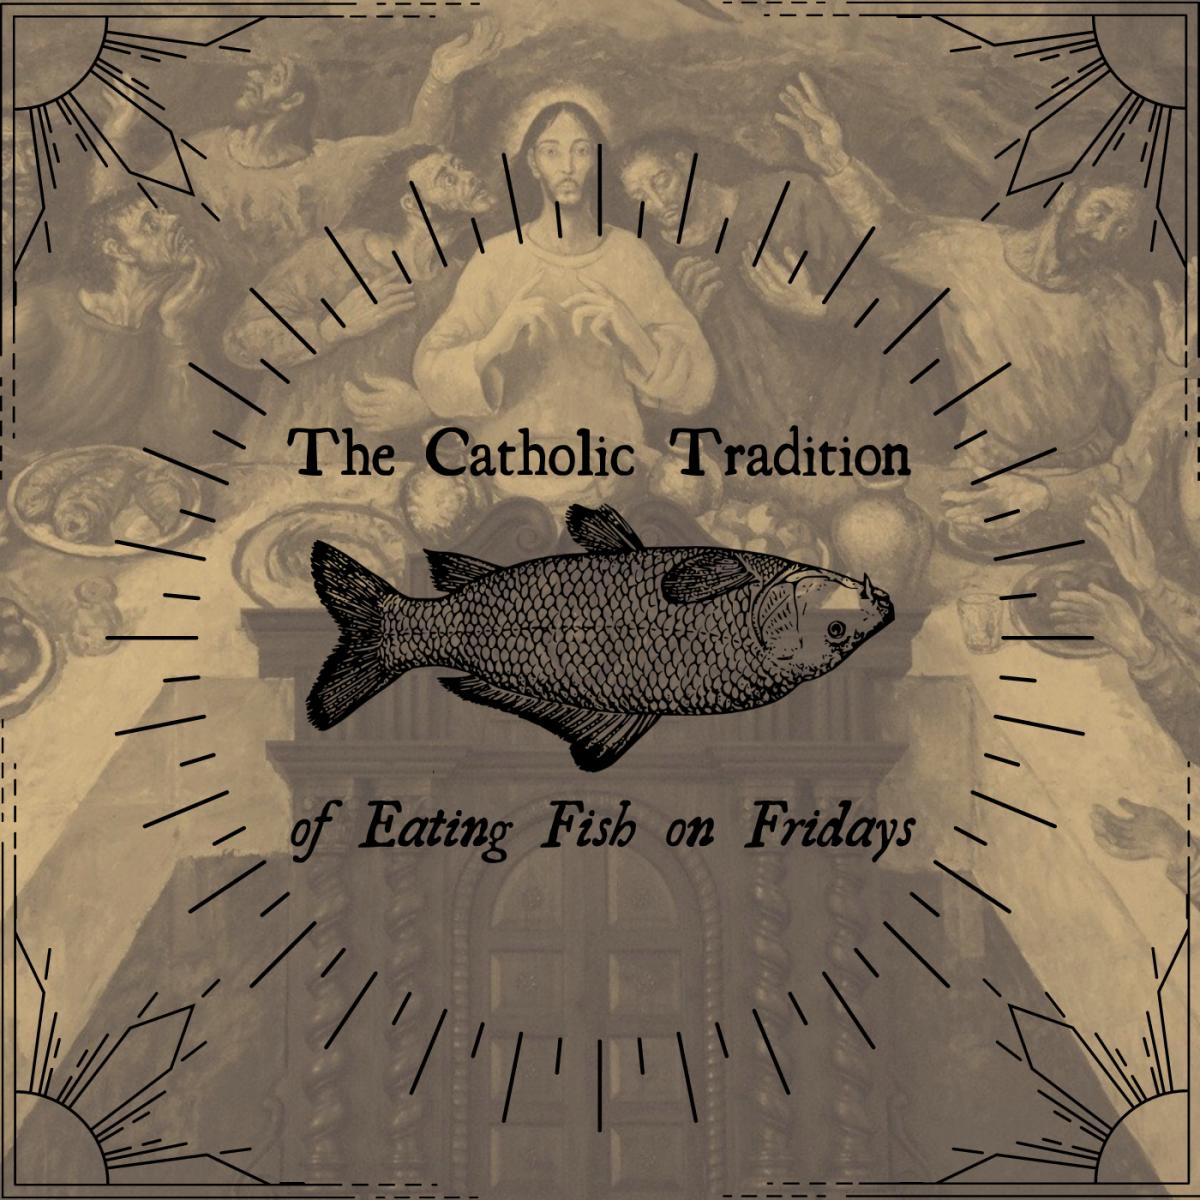 Most Catholics eat fish on Fridays during Lent, and some eat fish on Fridays year-round.